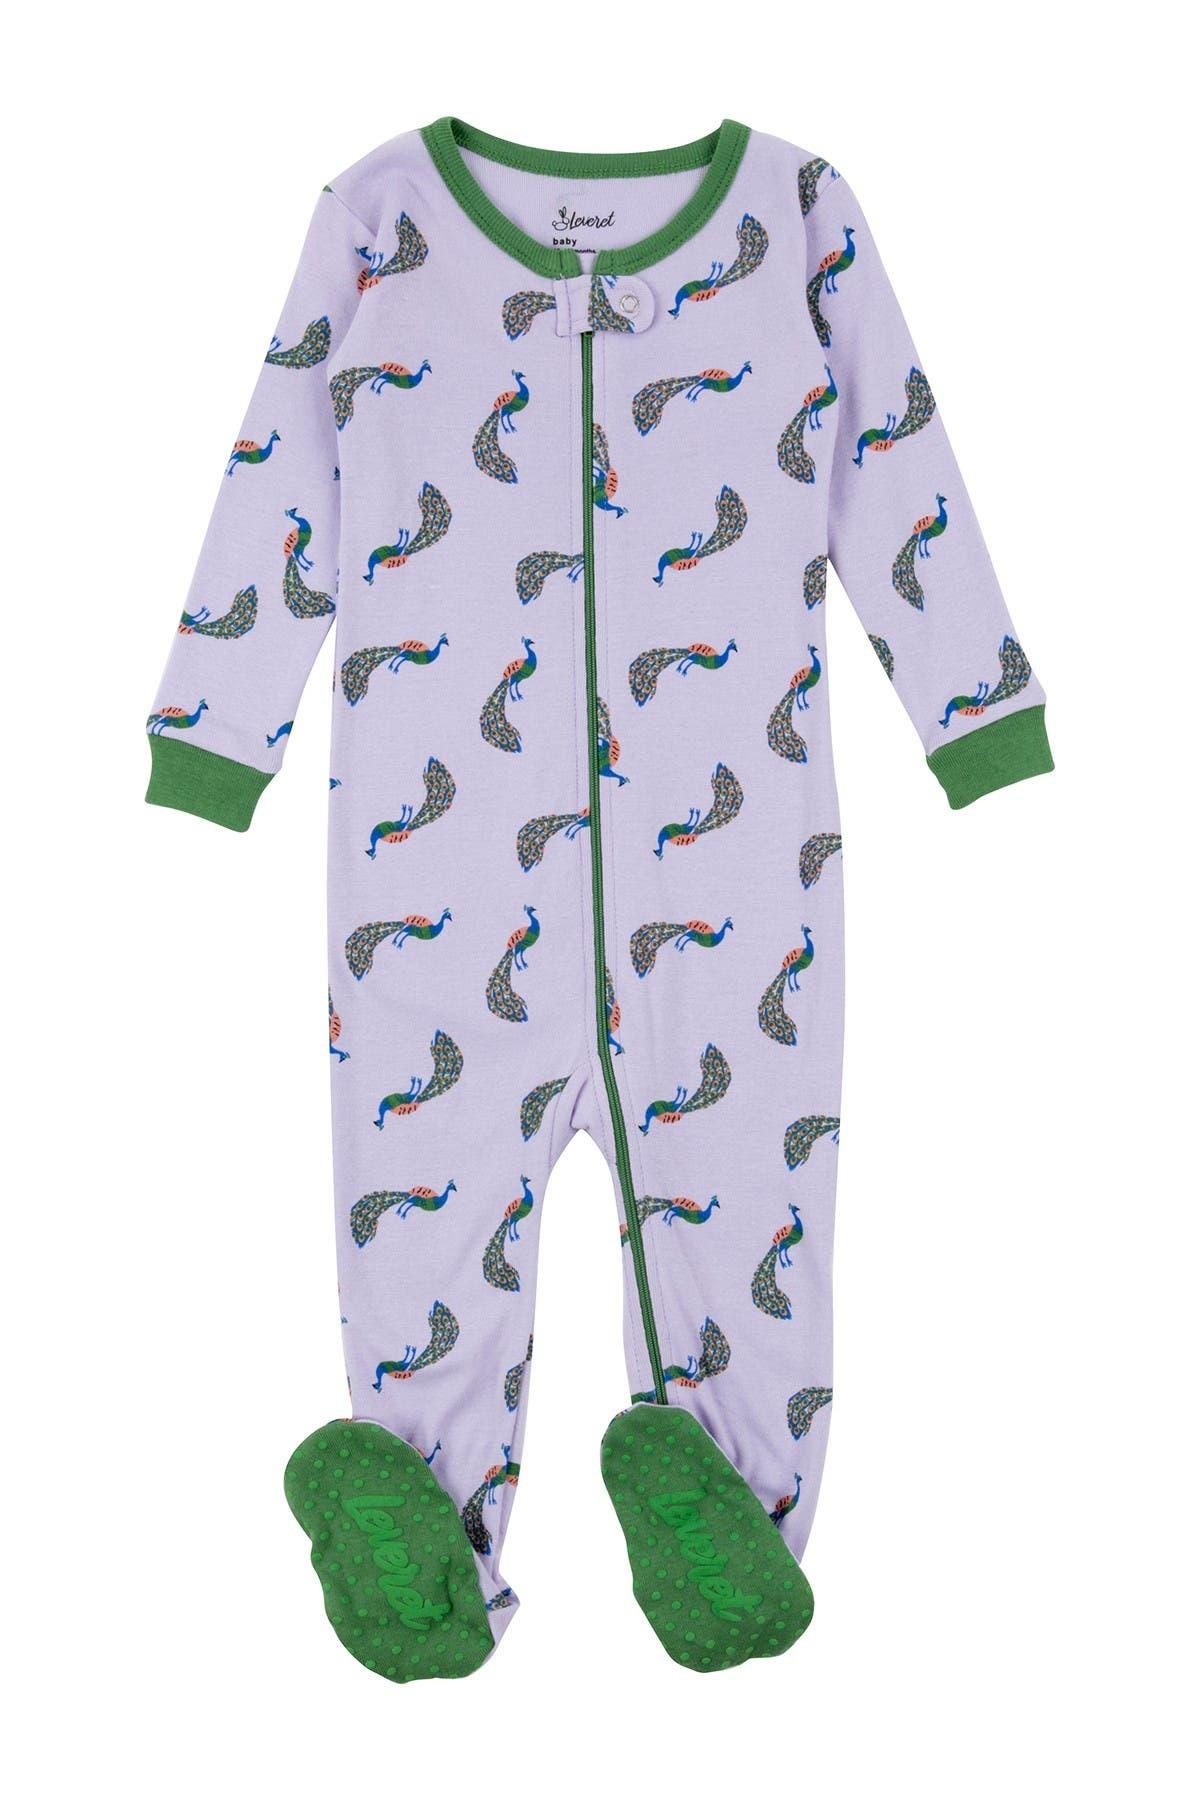 Image of Leveret Peacock Cotton Footie Pajama